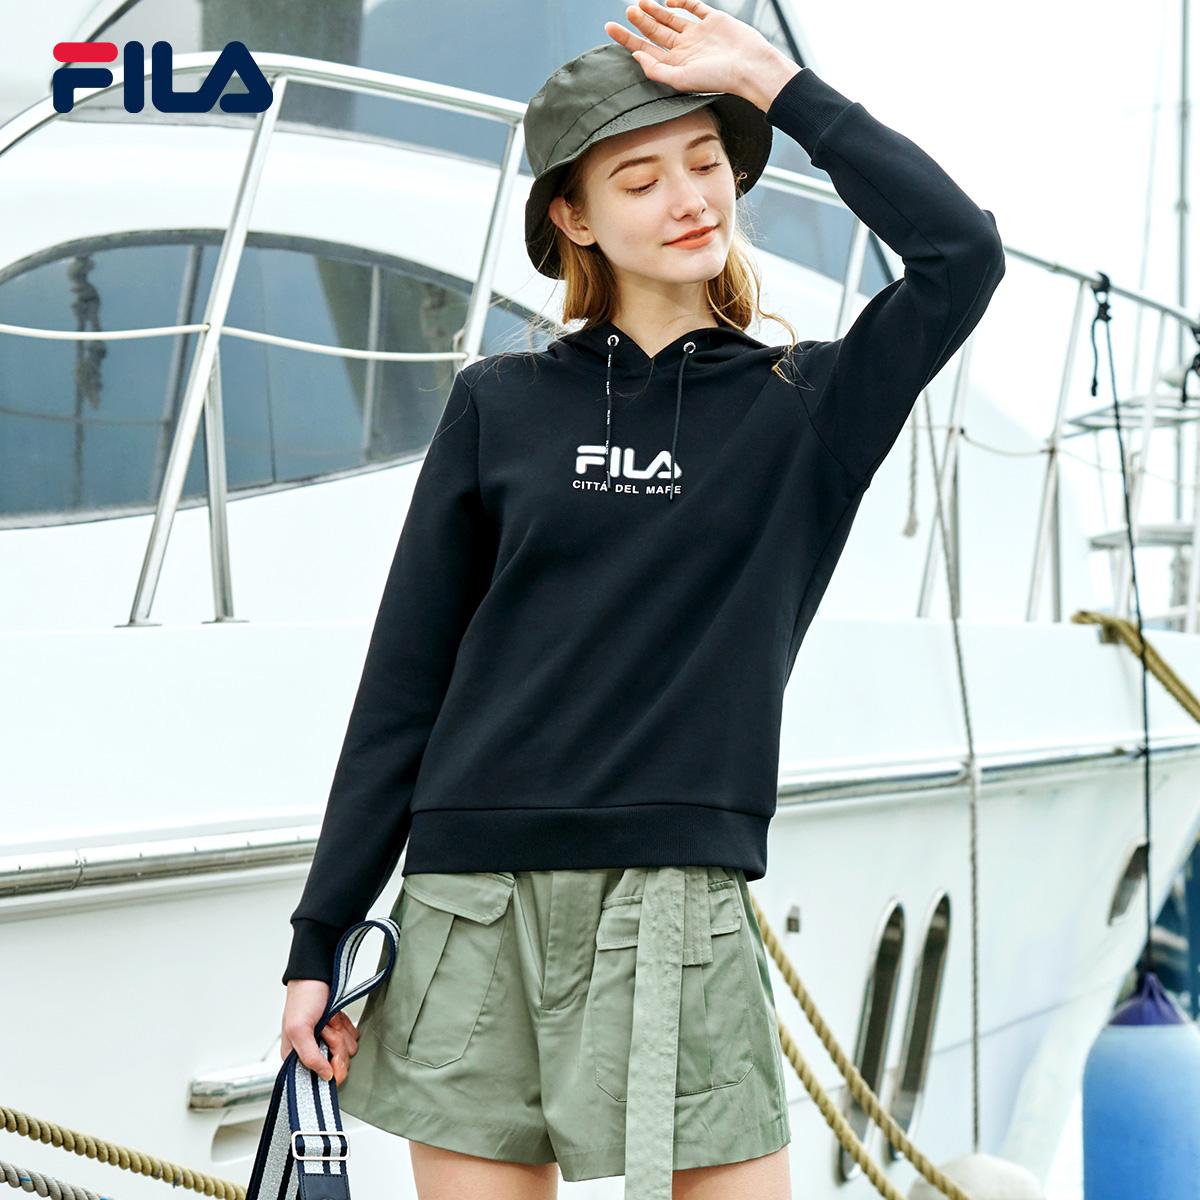 FILA 斐乐官方 女子连帽卫衣 2020春季新款舒适休闲运动长袖衫